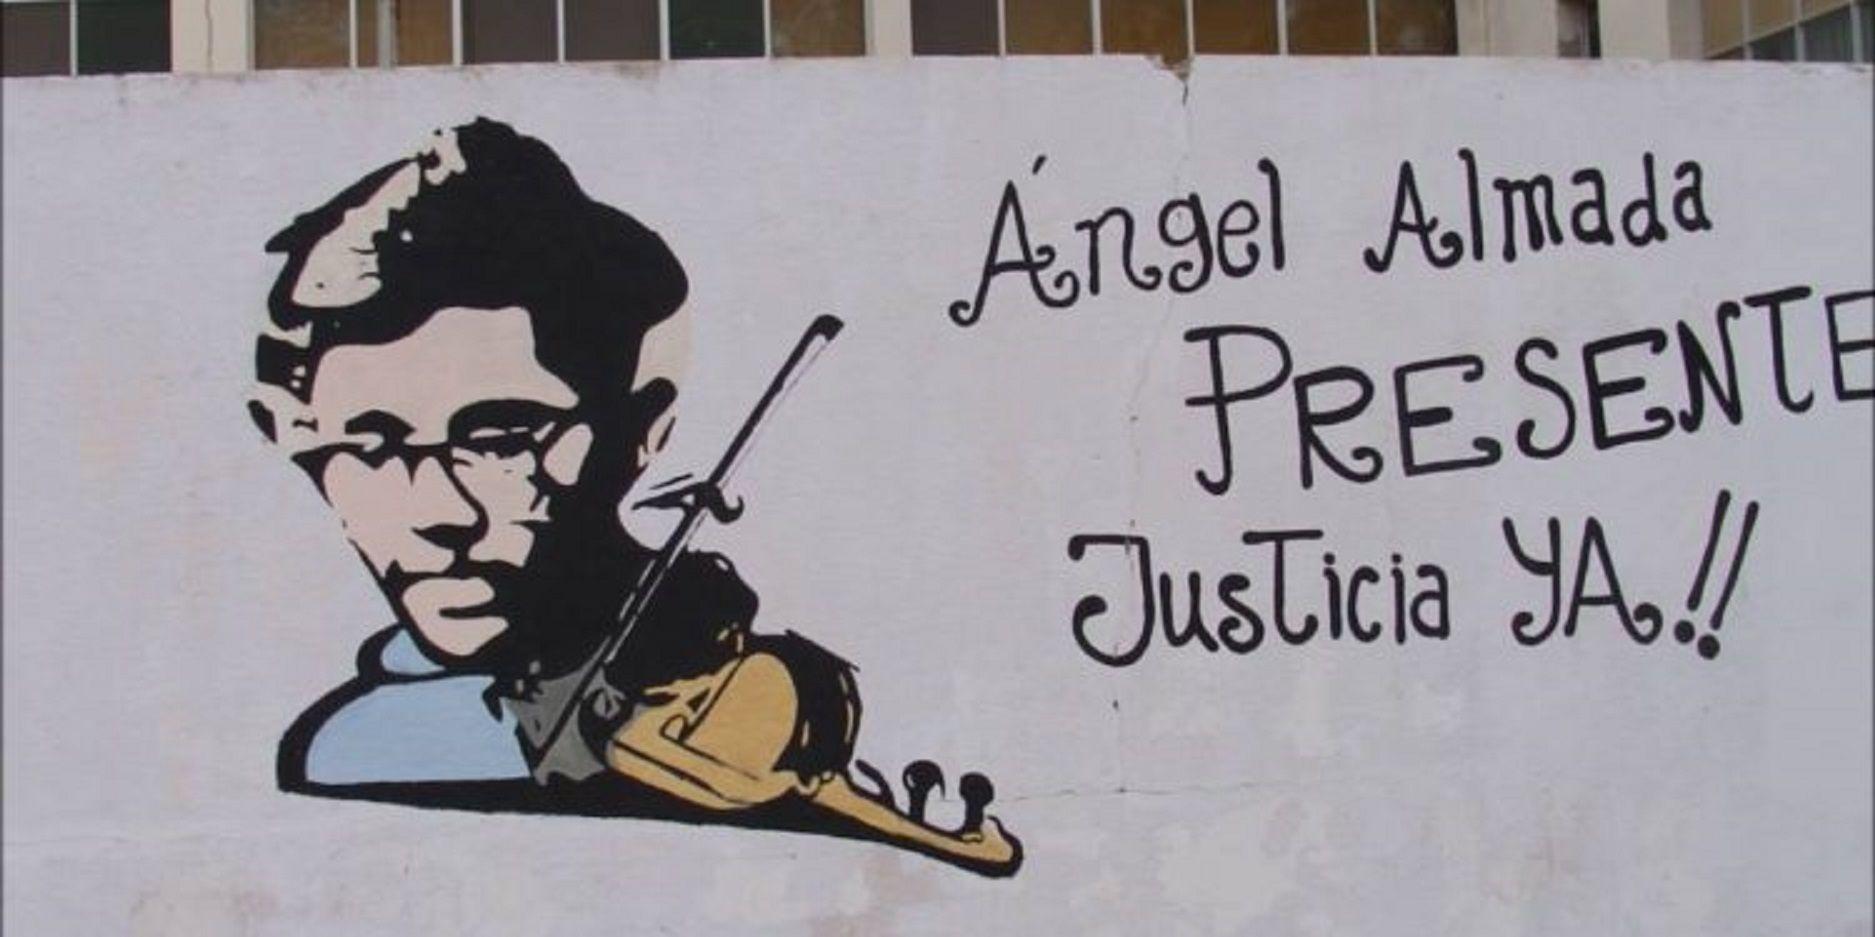 Ángel Almada